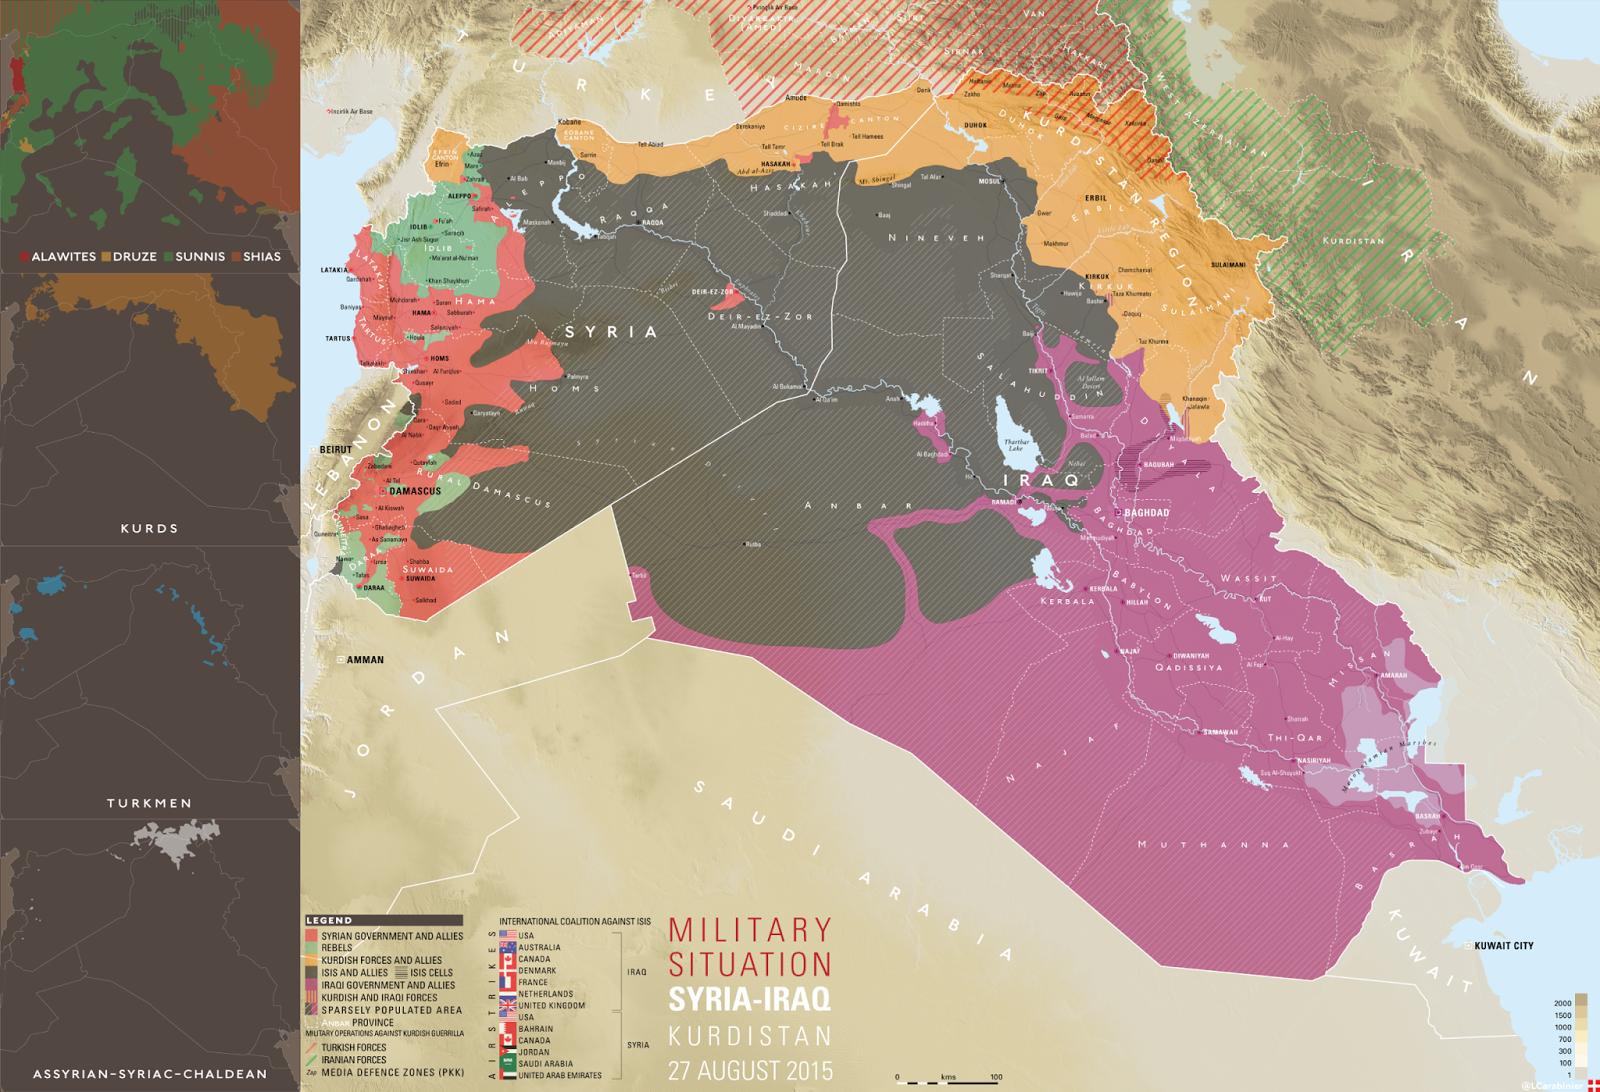 Military situation Syria, Iraq and Kurdistan